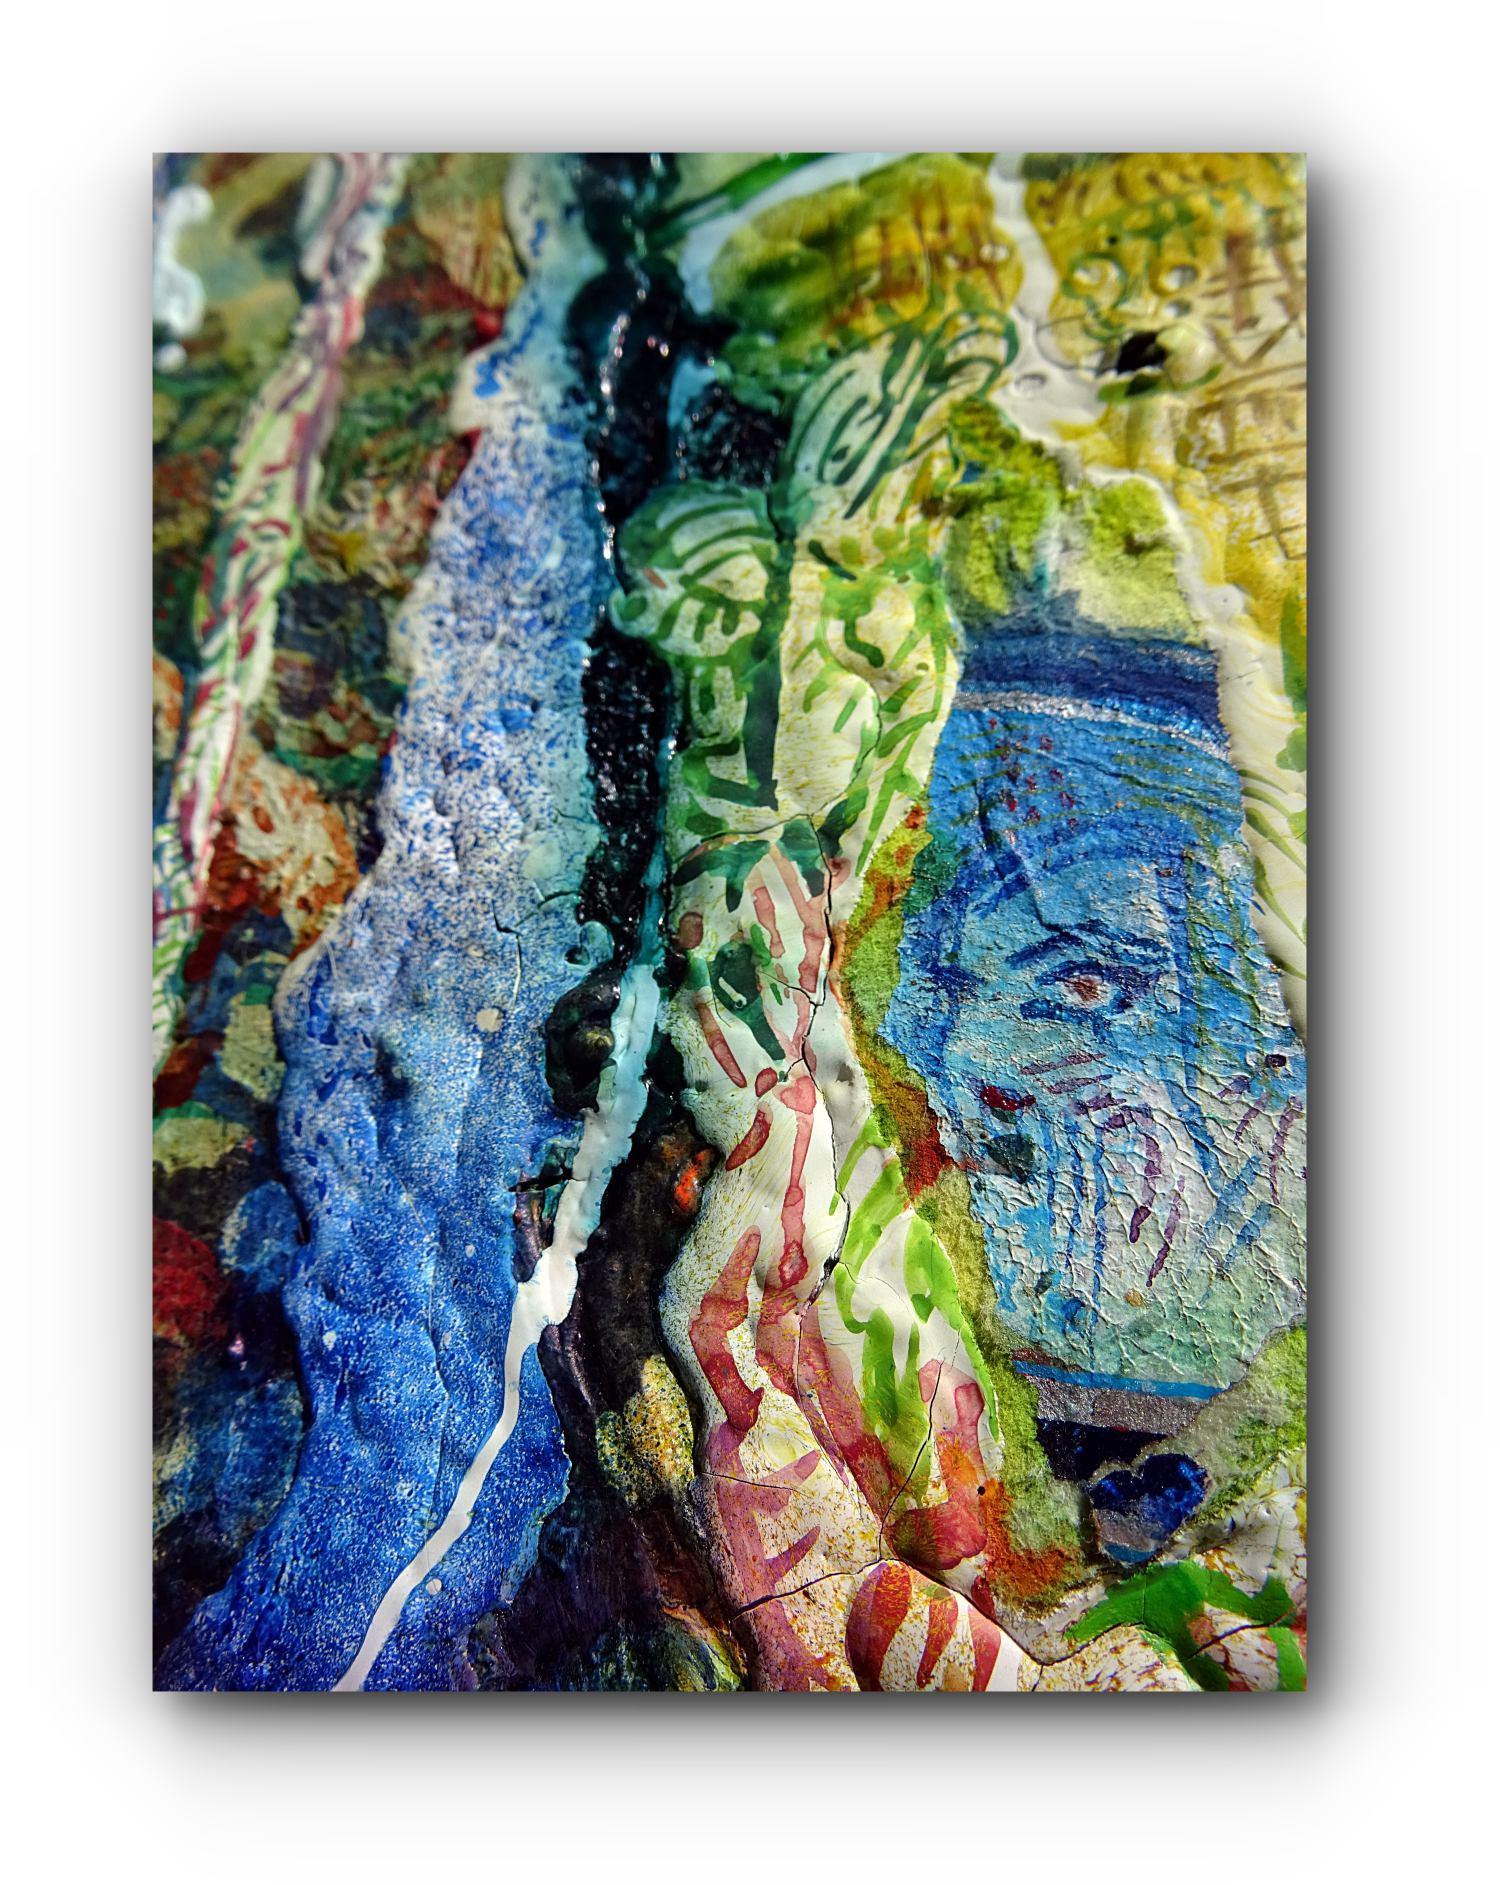 painting-detail-9-kiss-artist-duo-ingress-vortices.jpg